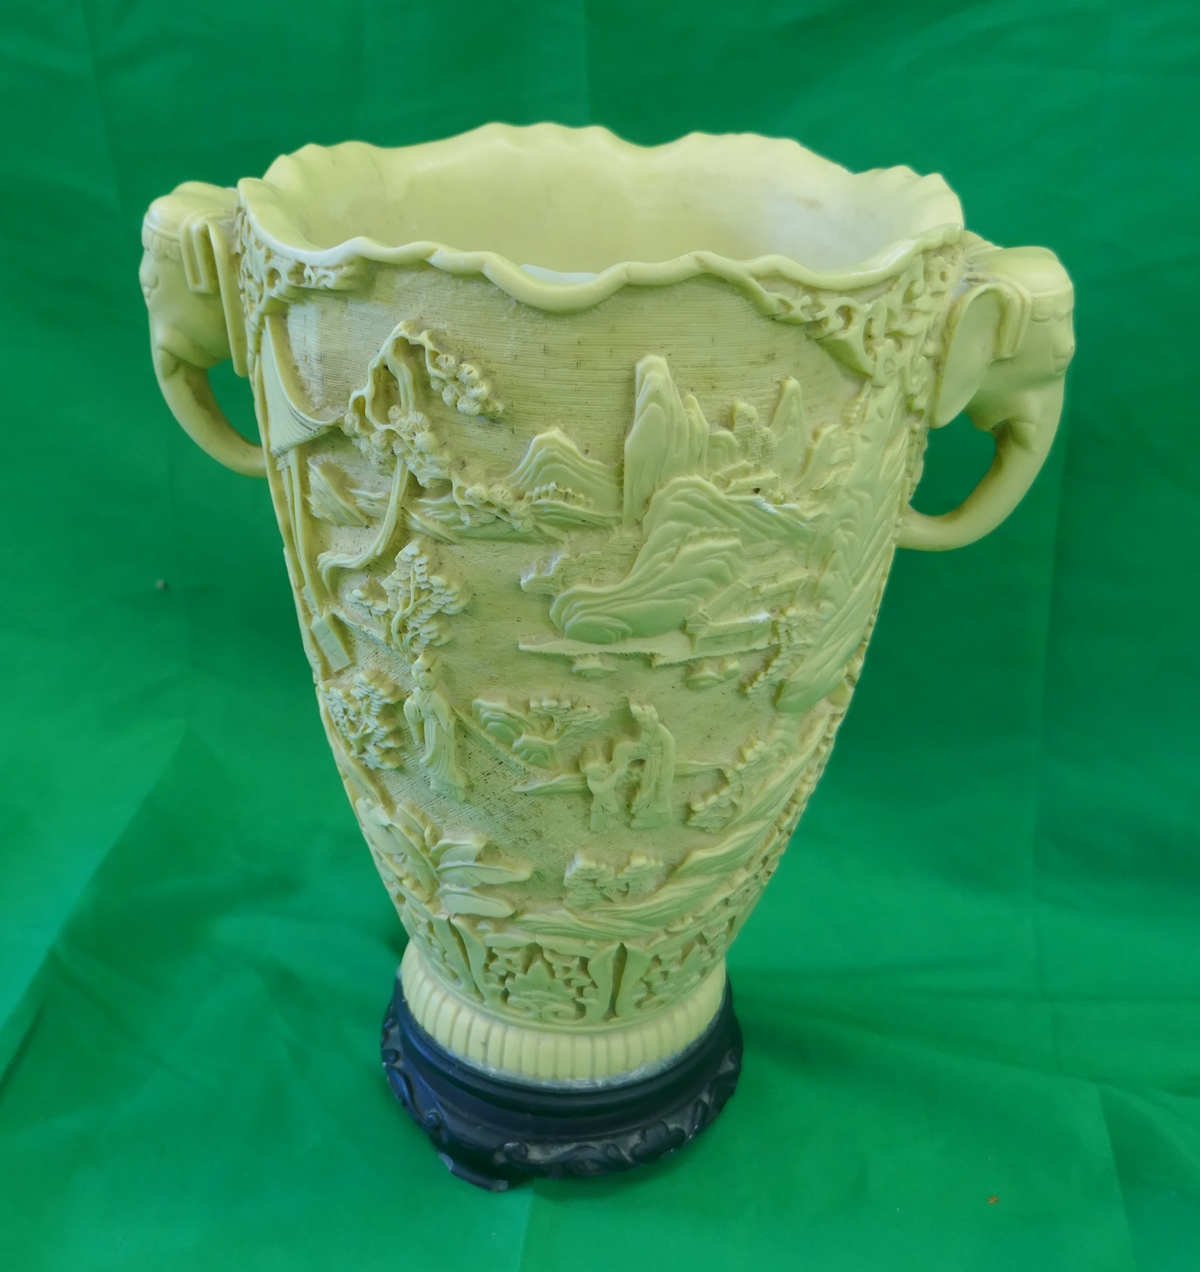 Unusual vase depicting elephants - Approx H: 31cm